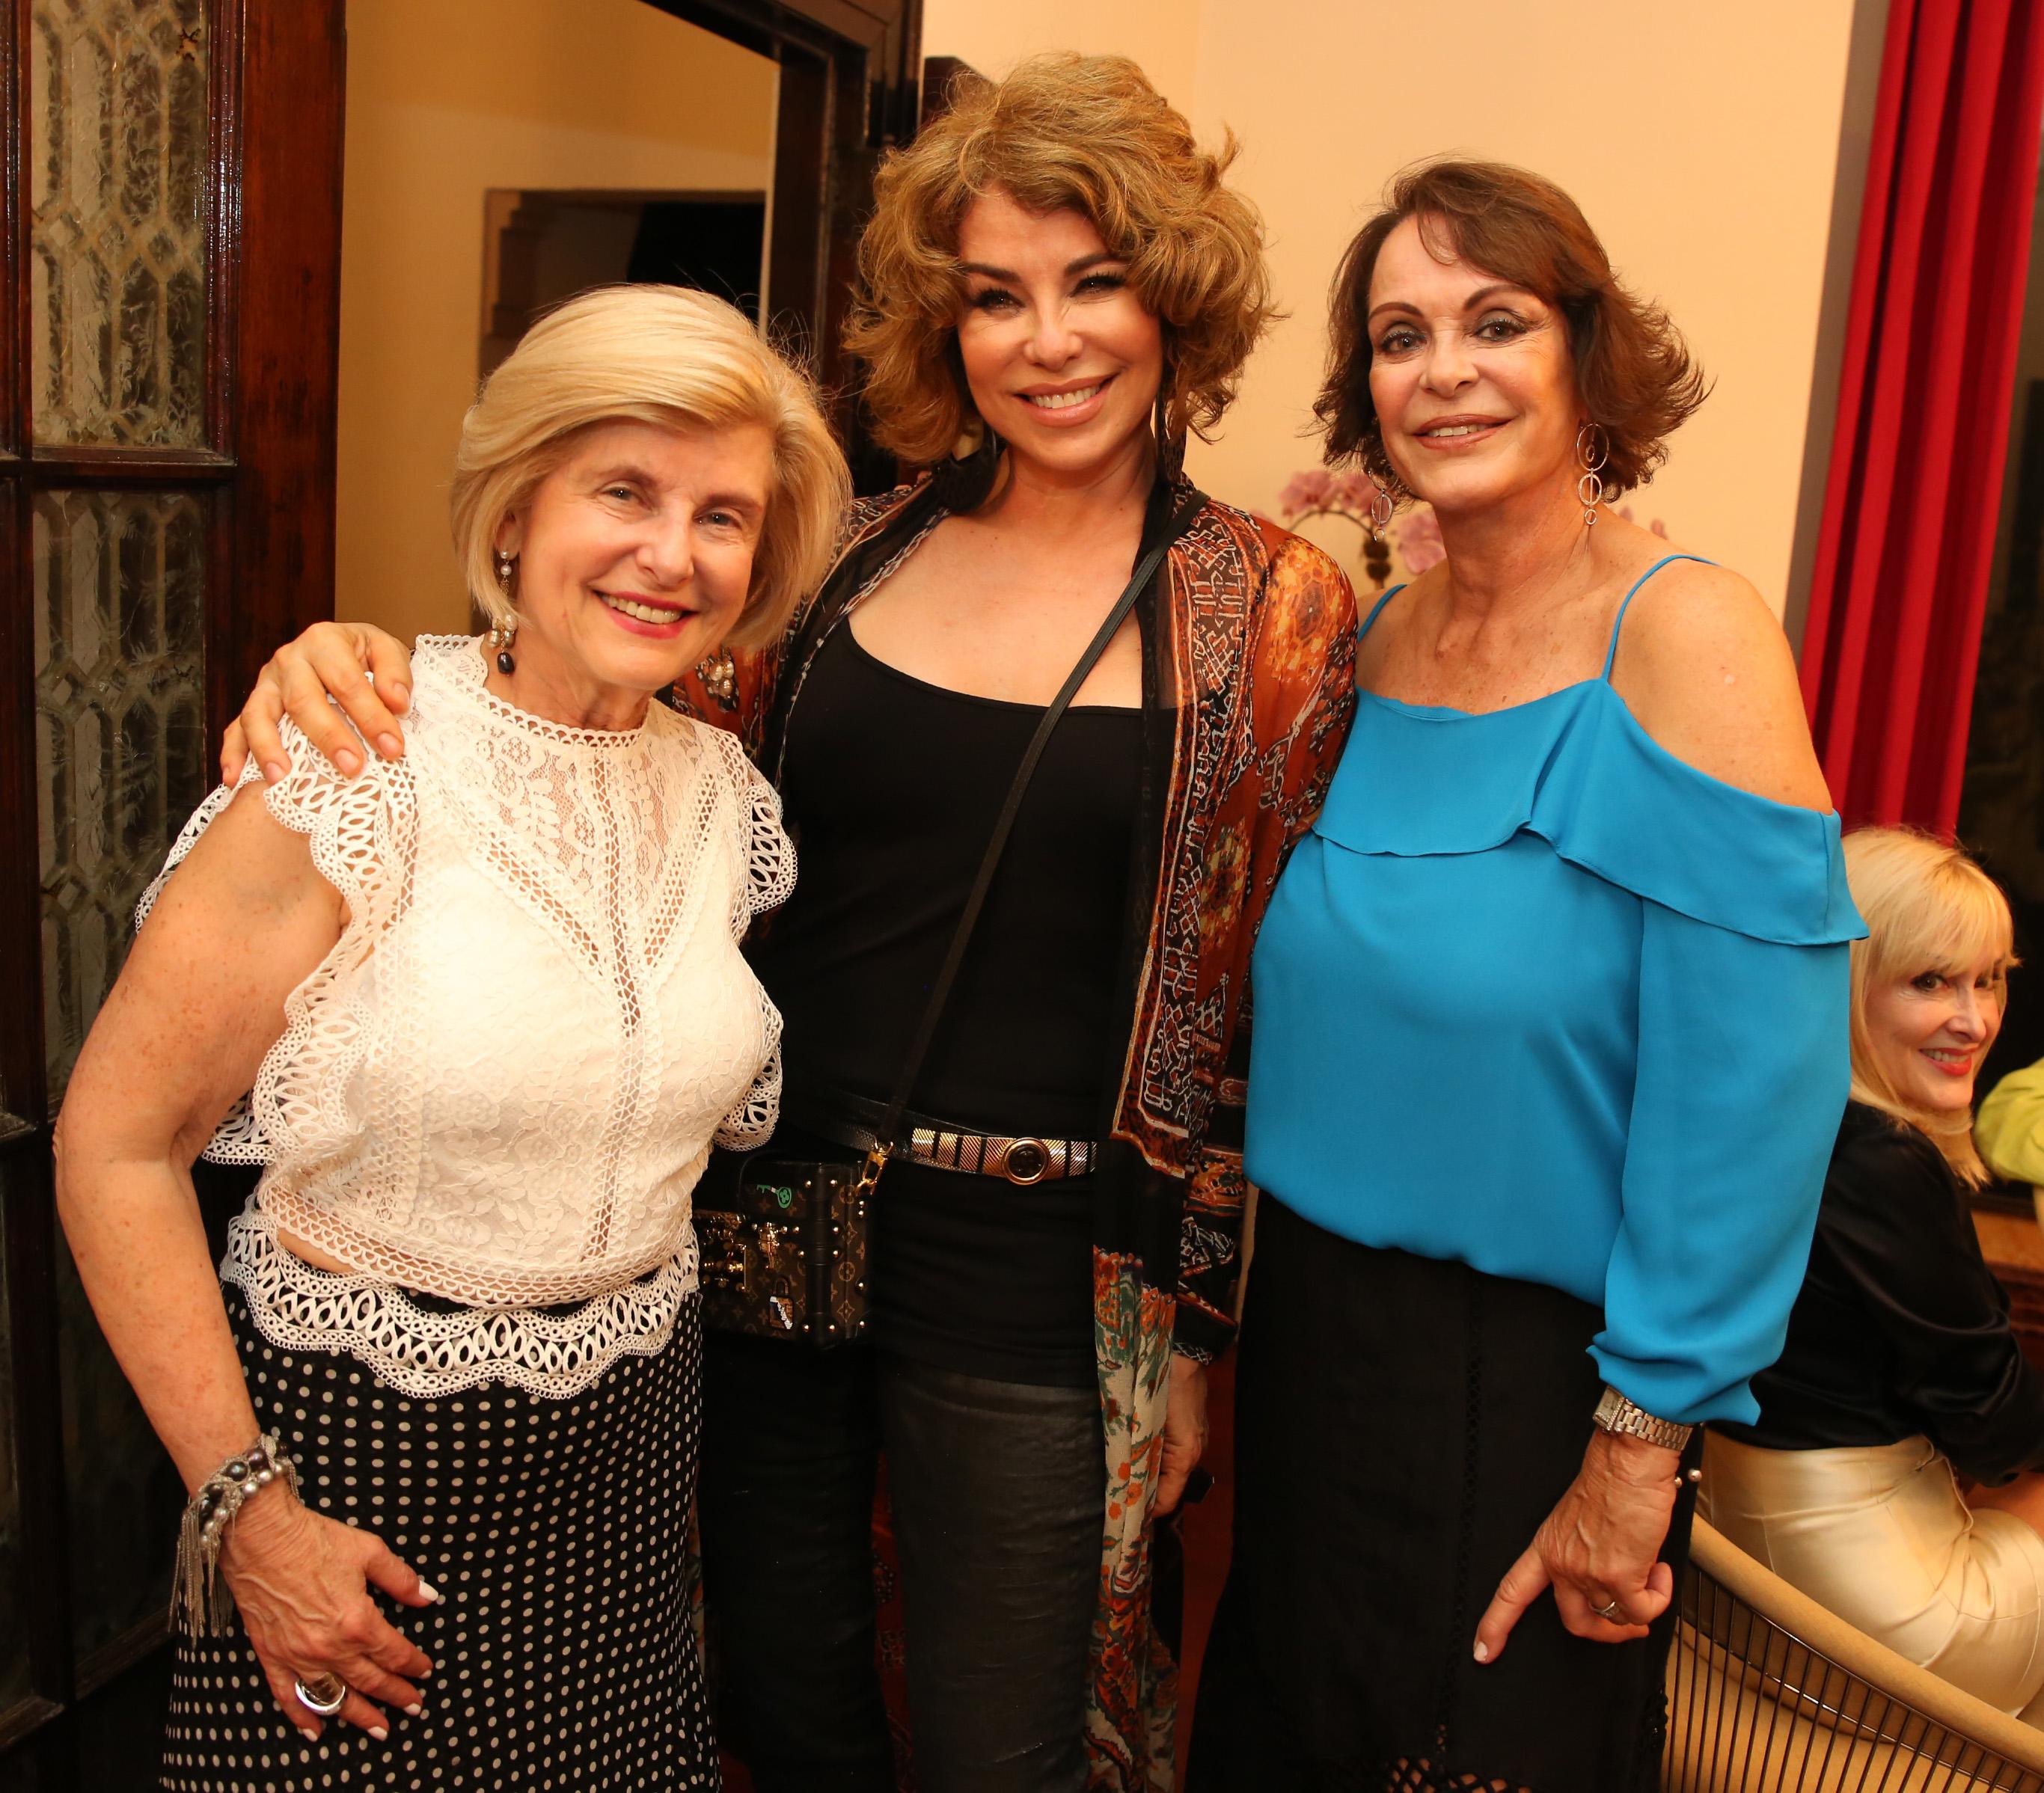 Zoila Levis, Ana Abislaimán y Carola Acosta. (José. R. Pérez Centeno)